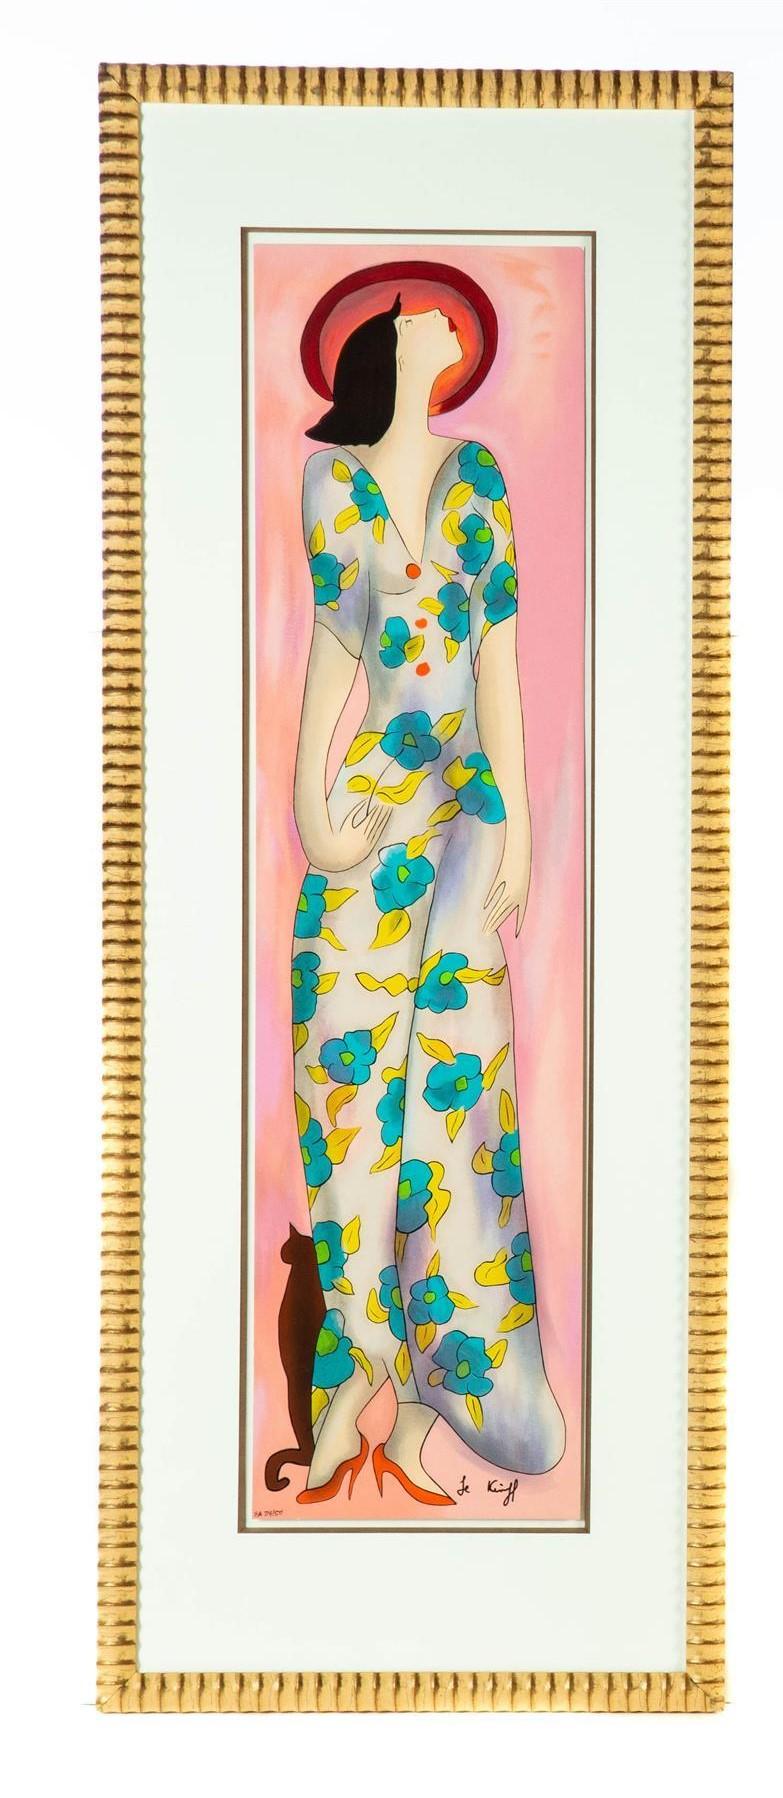 Fraicheur (Freshness) by  Linda Le Kinff - Masterpiece Online